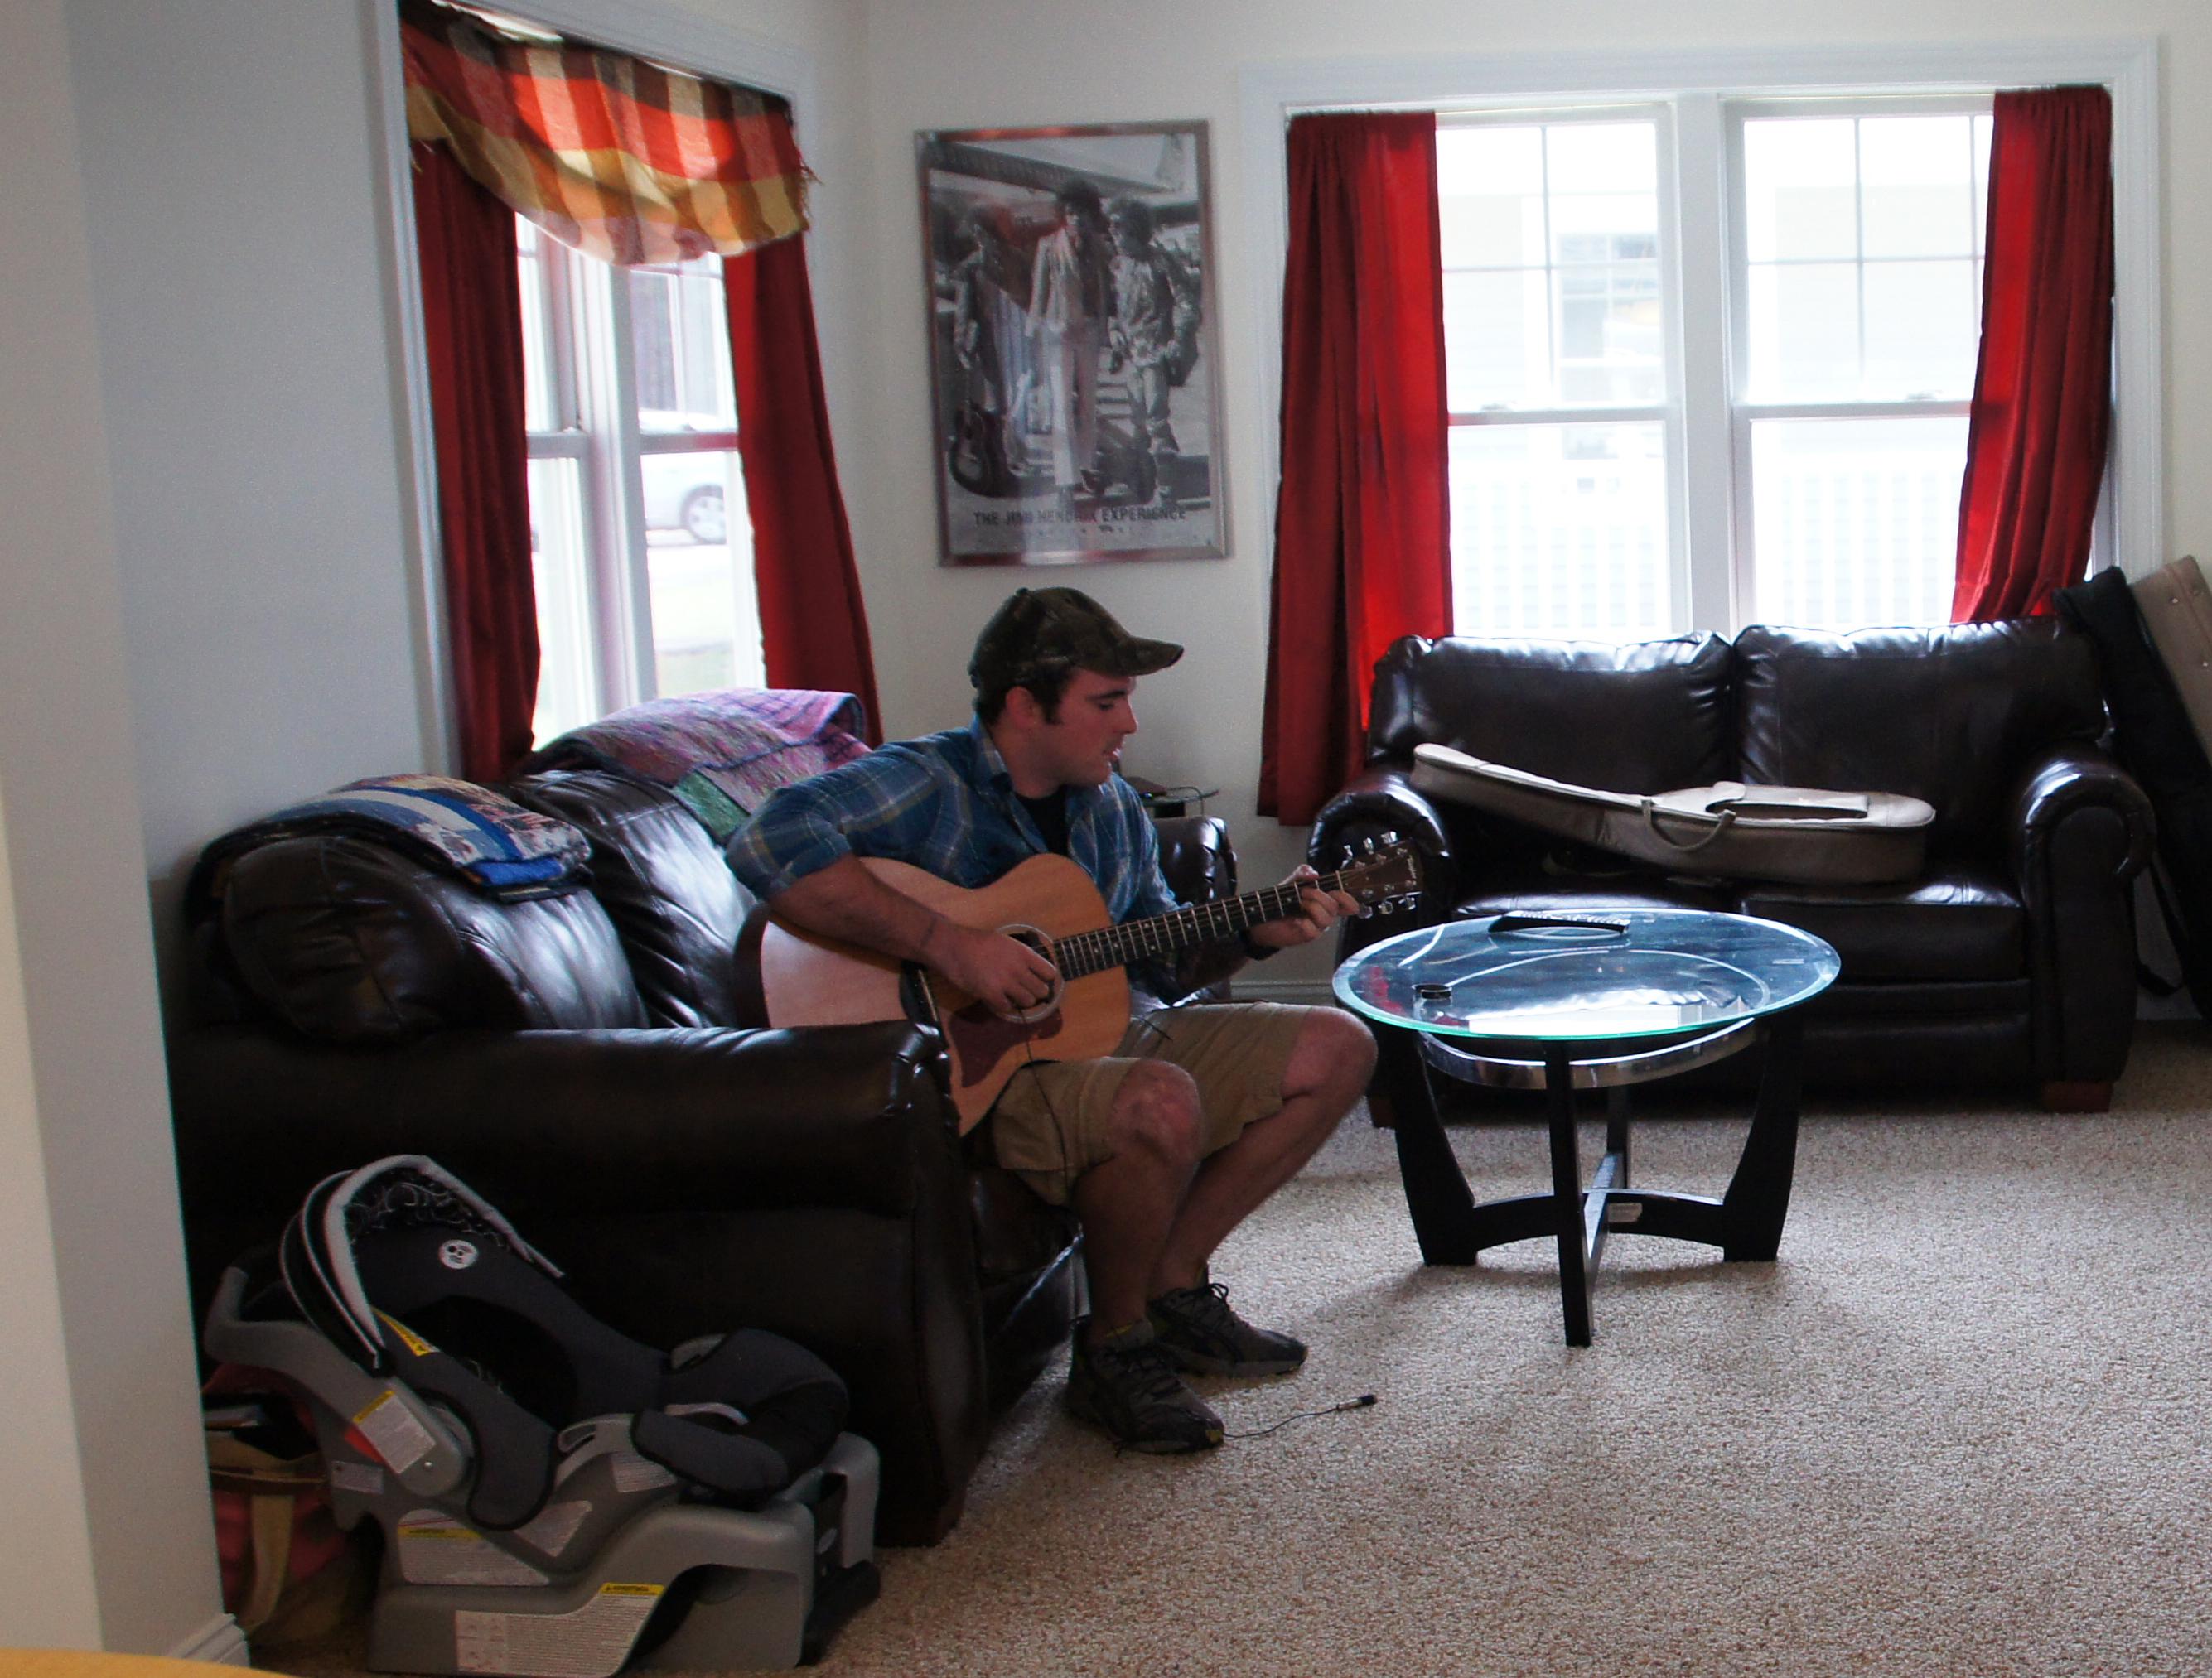 NVTRC vet playing guitar